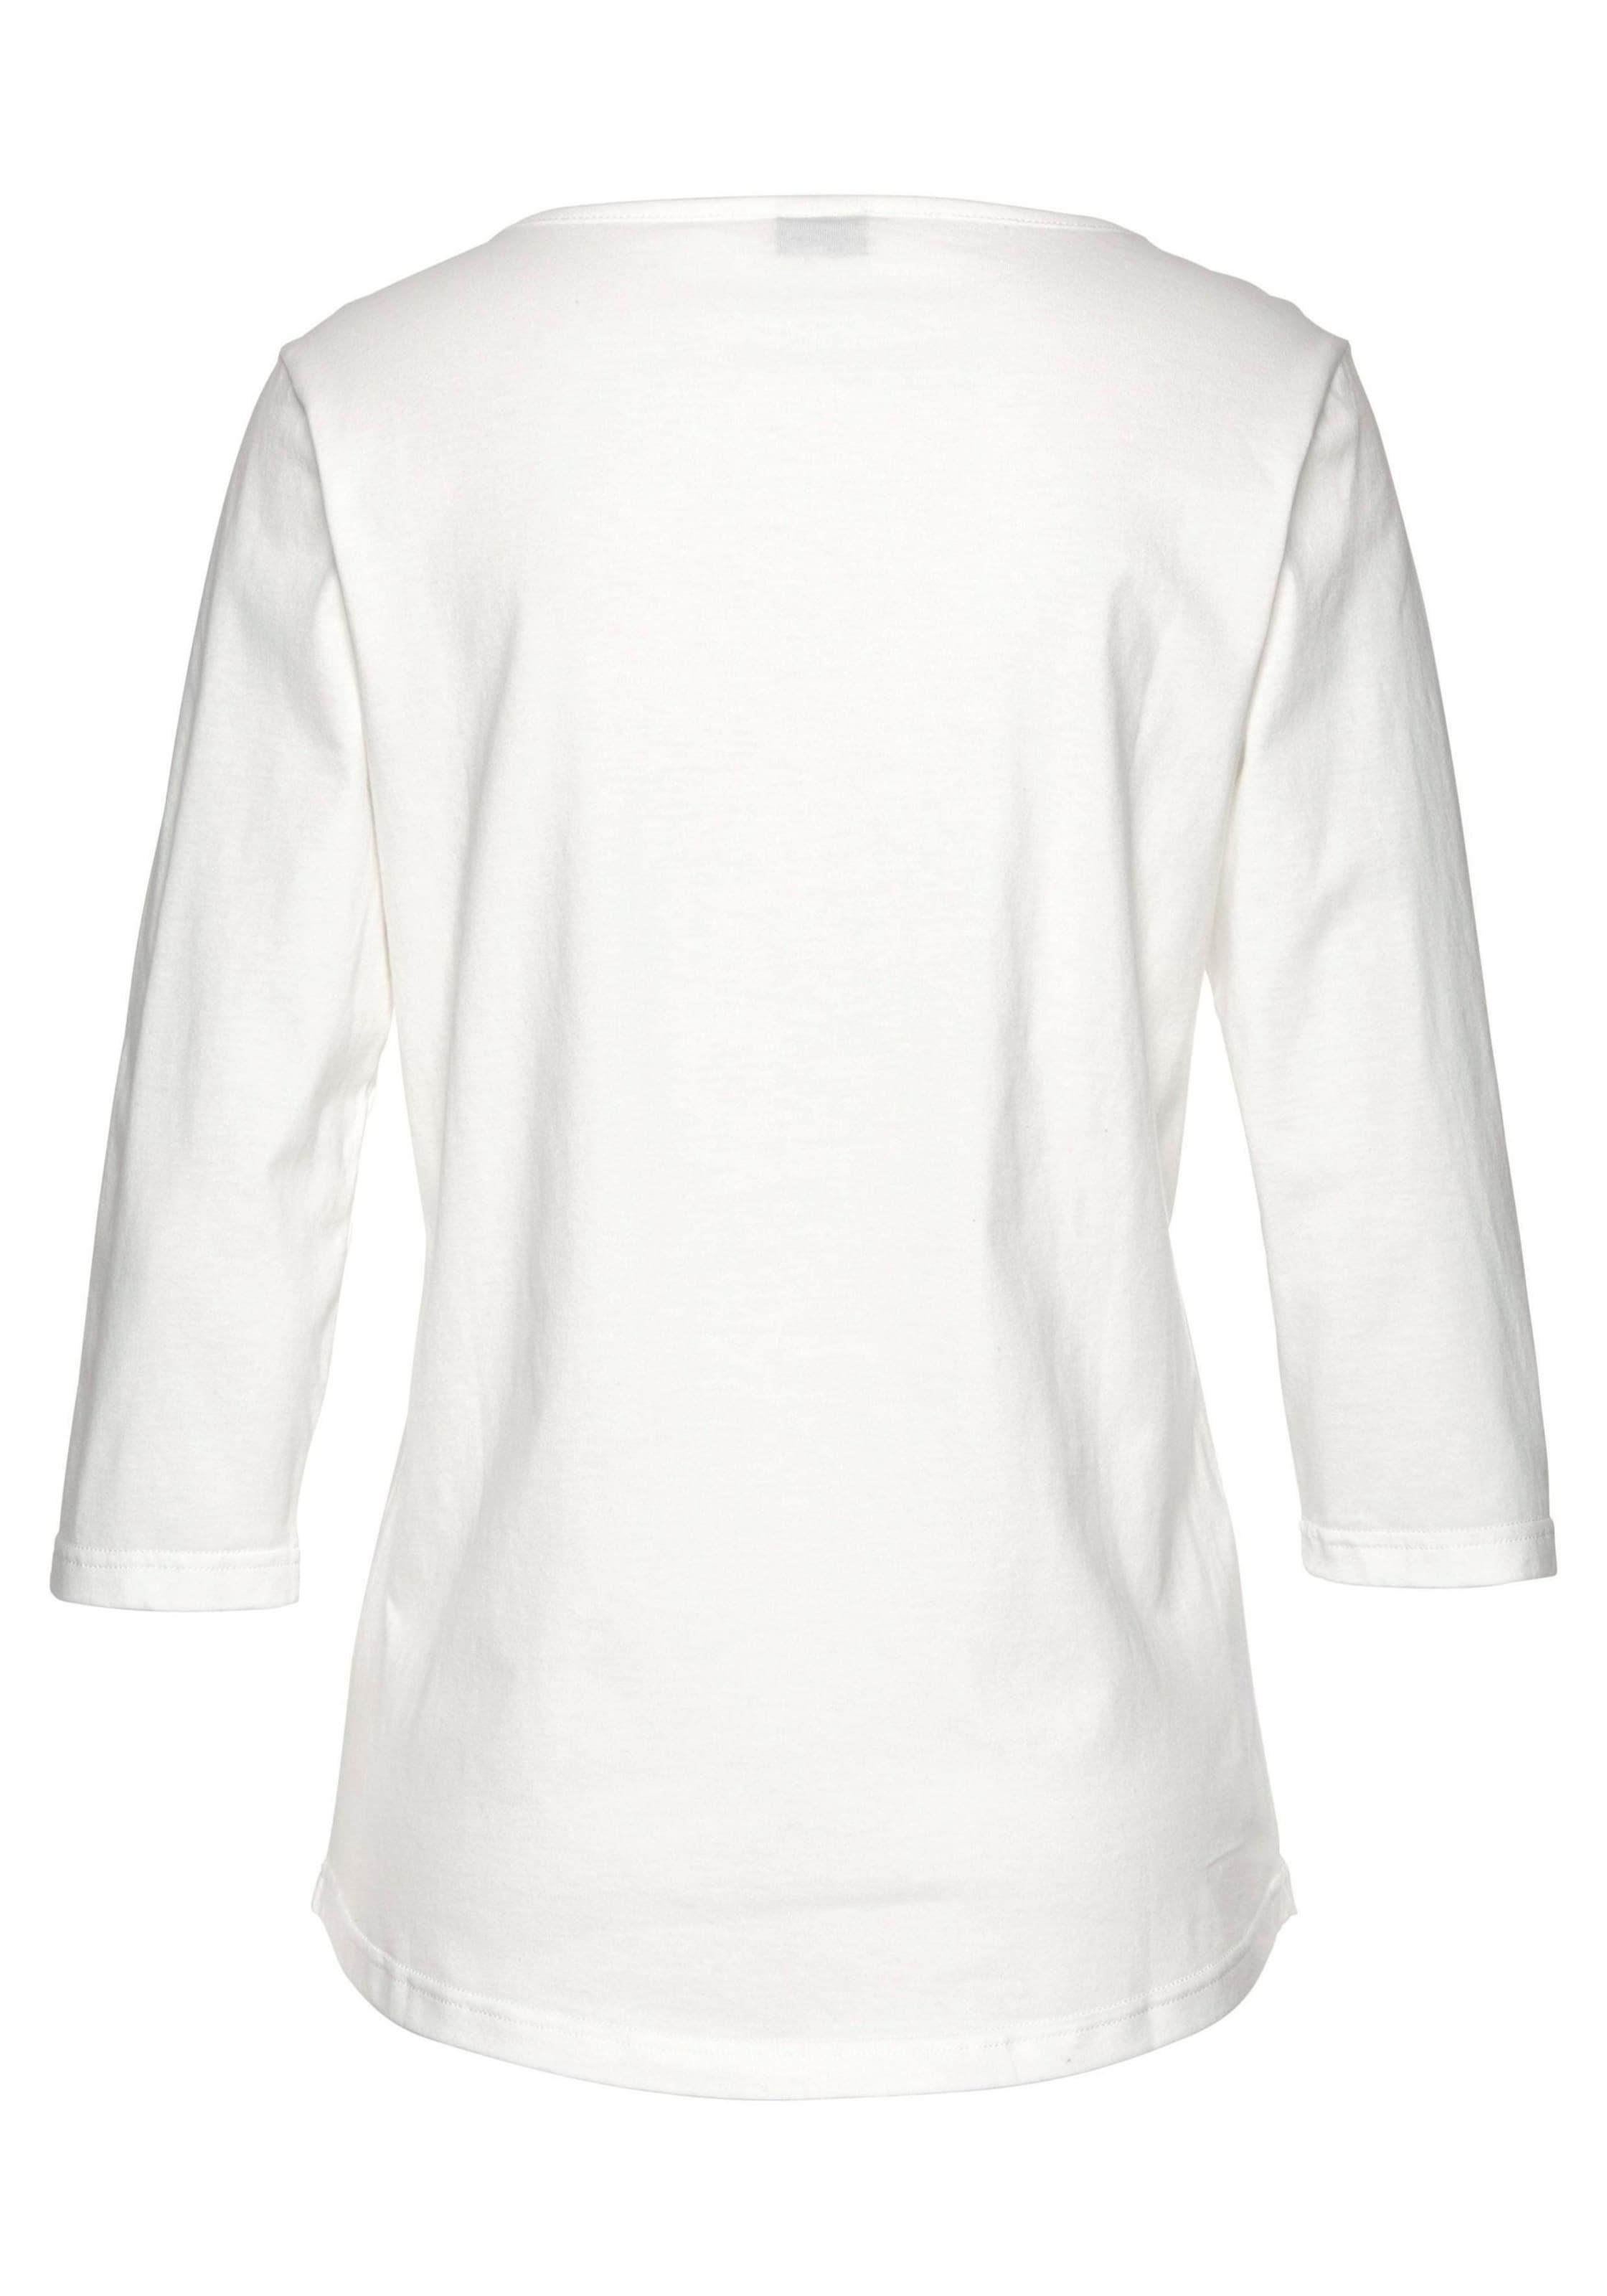 Lascana In Weiß Shirt Weiß Lascana Weiß Shirt Lascana In Shirt In Lascana Shirt dCBxeo